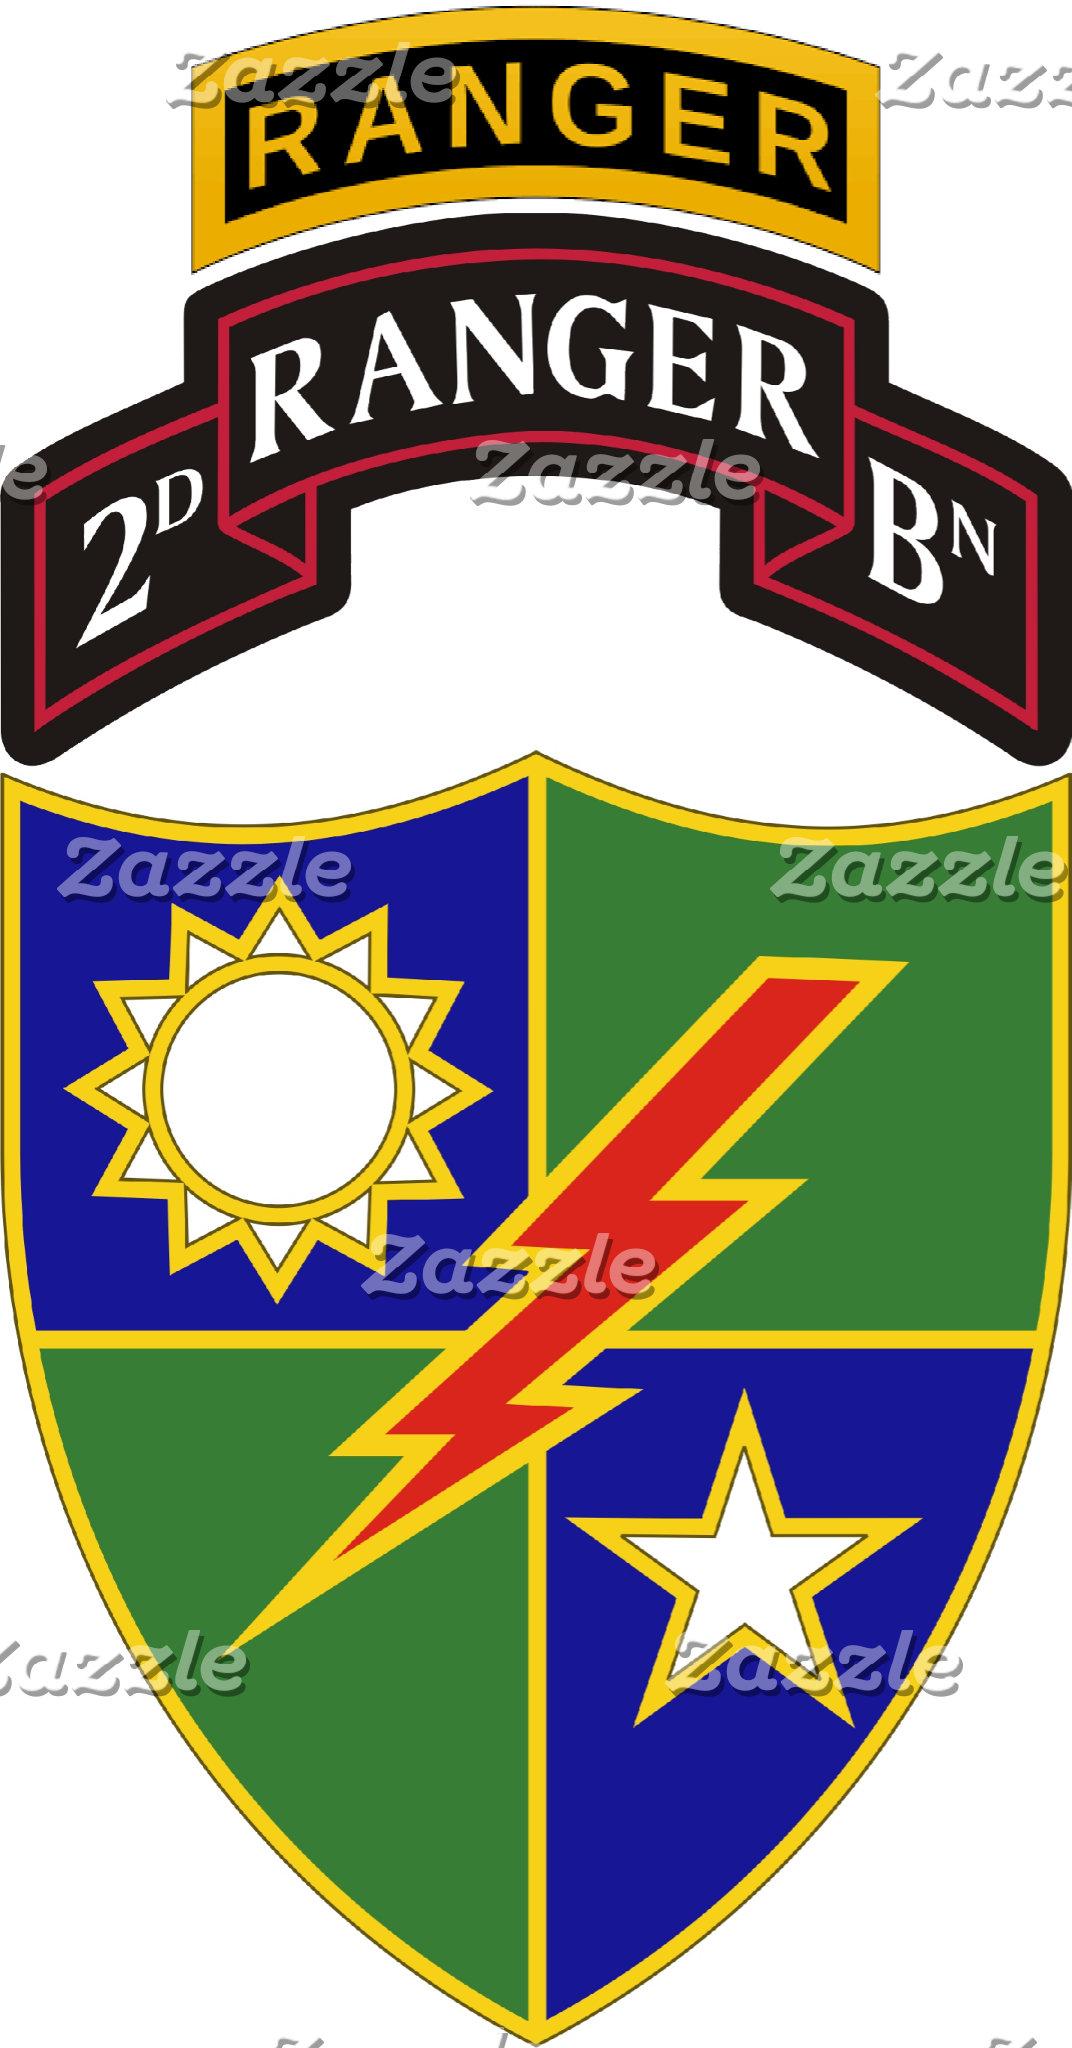 2nd Battalion - 75th Ranger Regiment w/ Ranger Tab